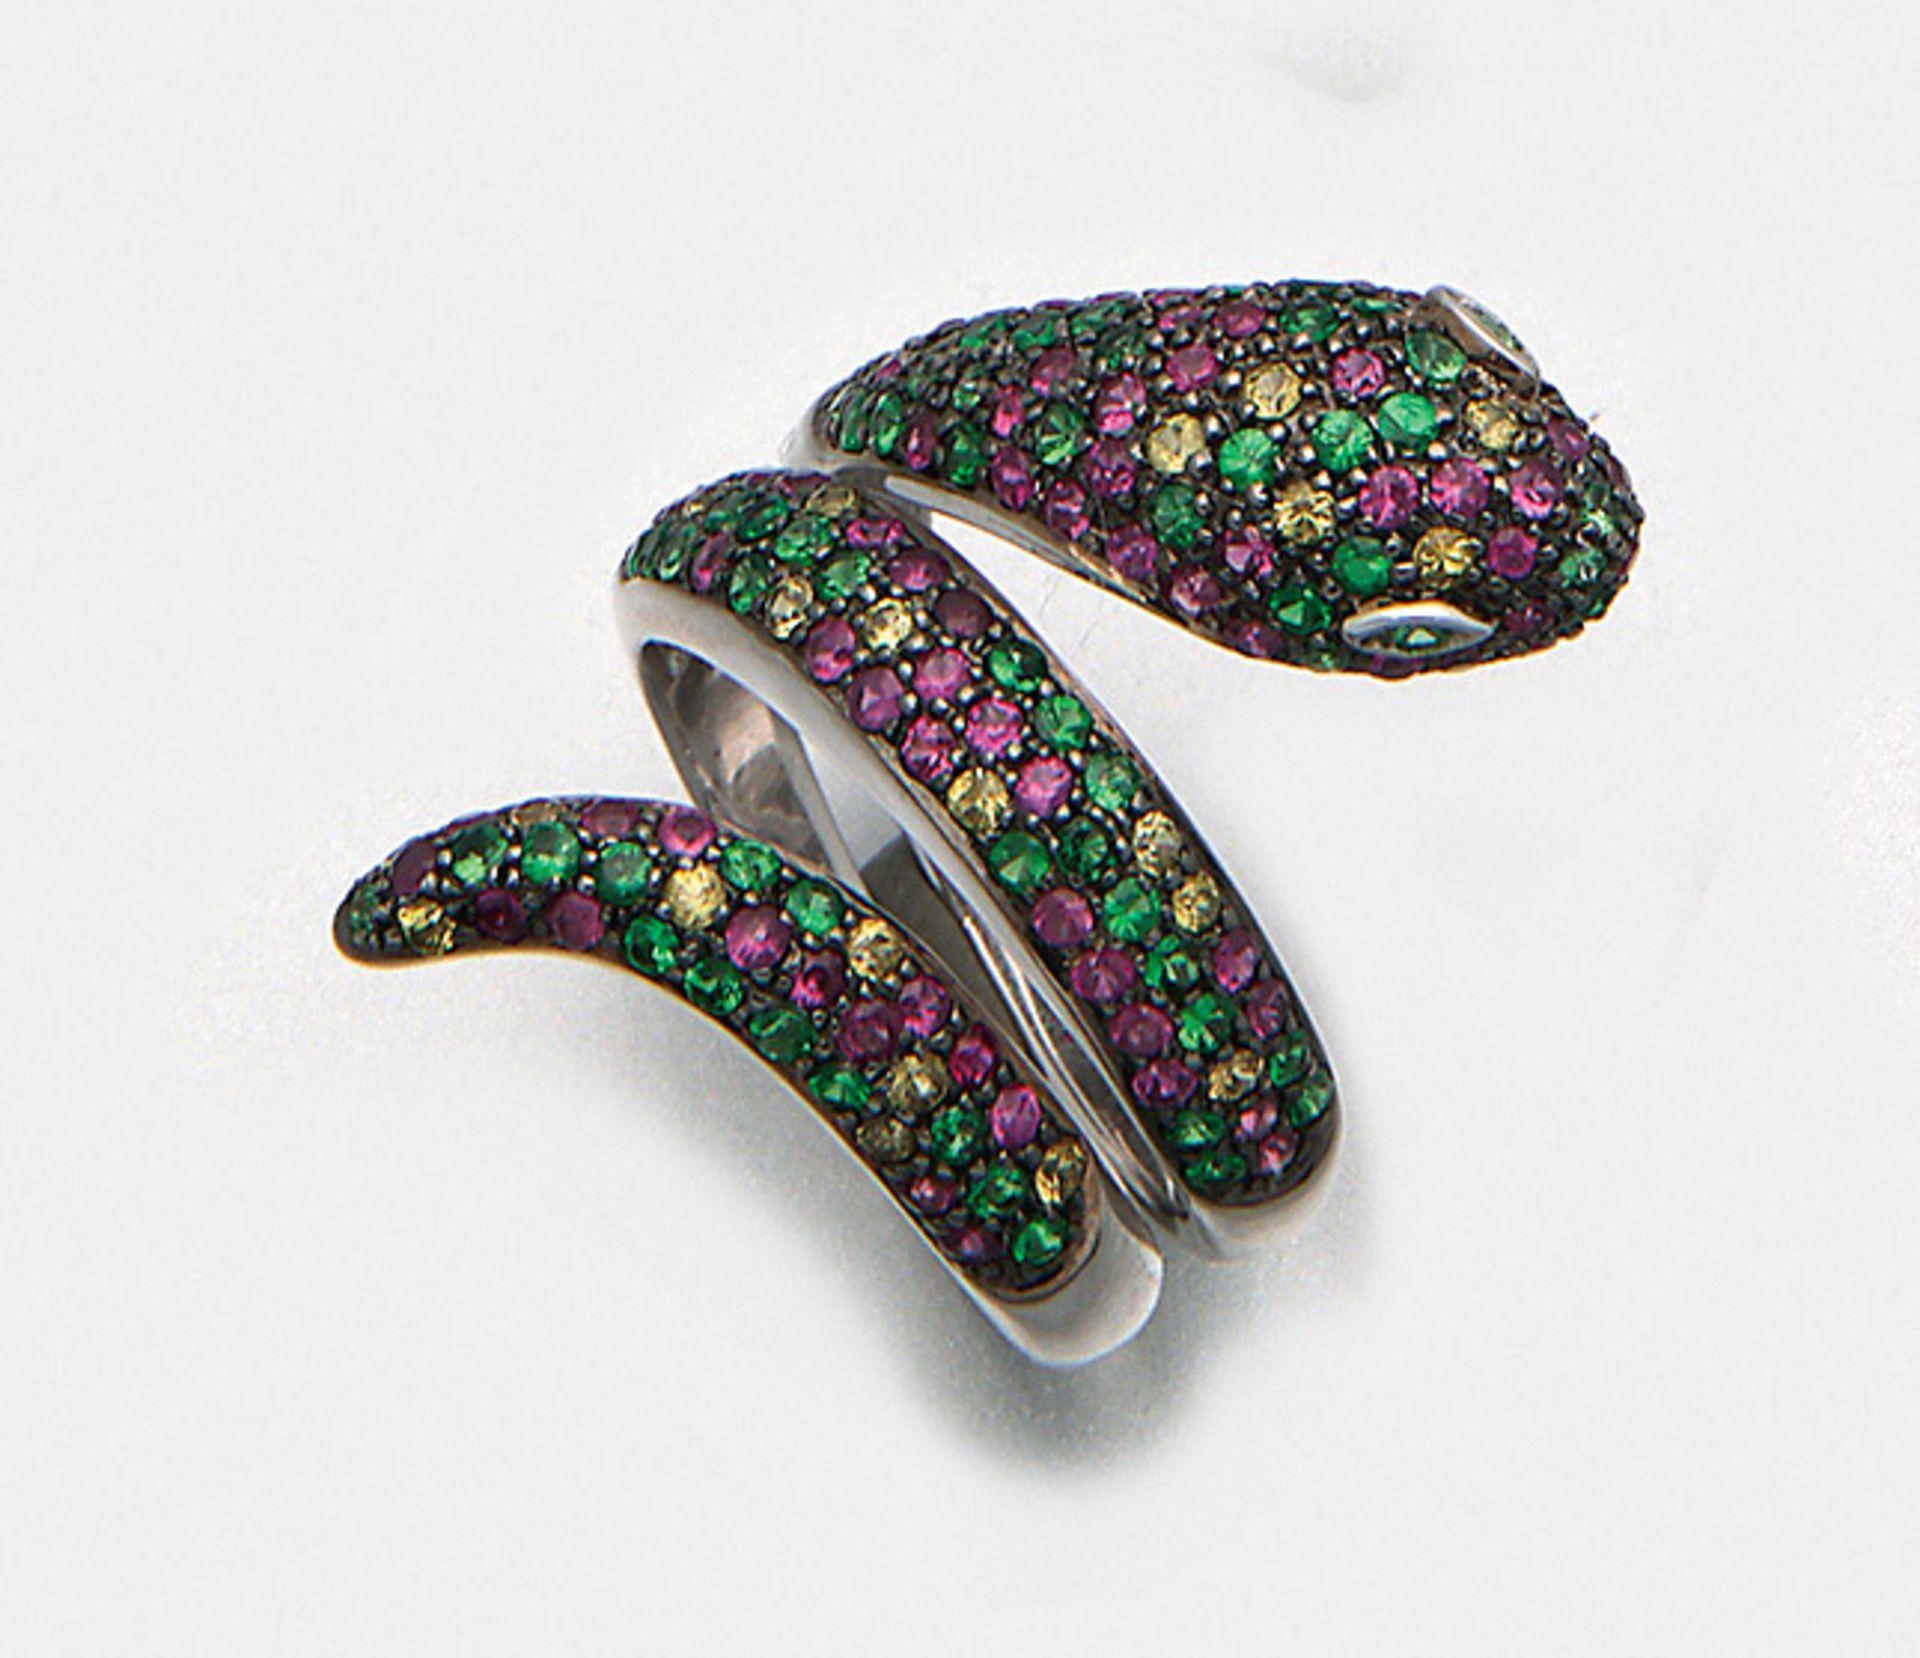 Dekorativer Multicolor-Schlangenring